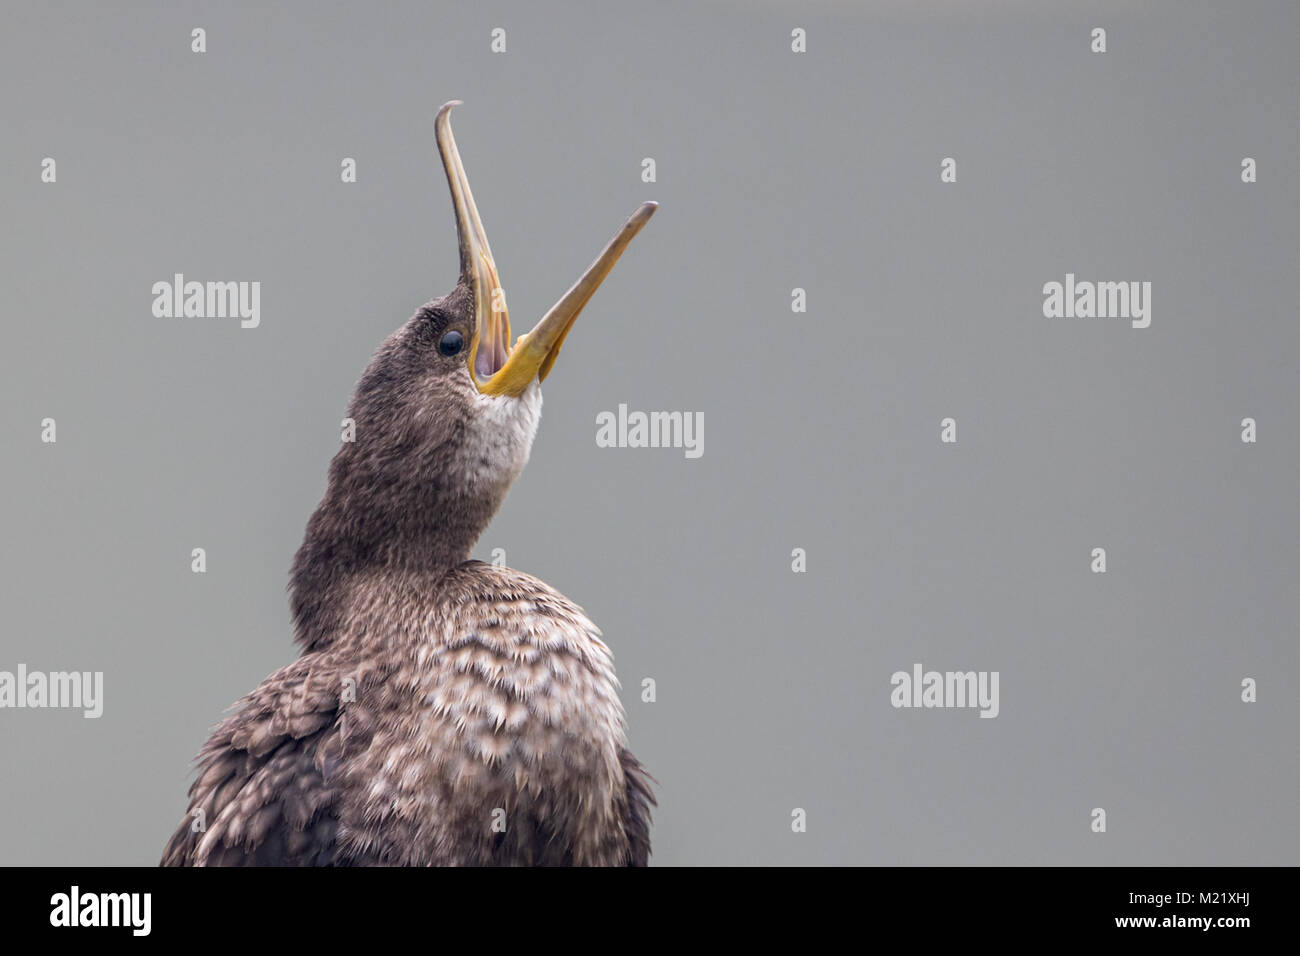 birds at Bharatpur Bird Sanctuary in Rajasthan, India - Stock Image